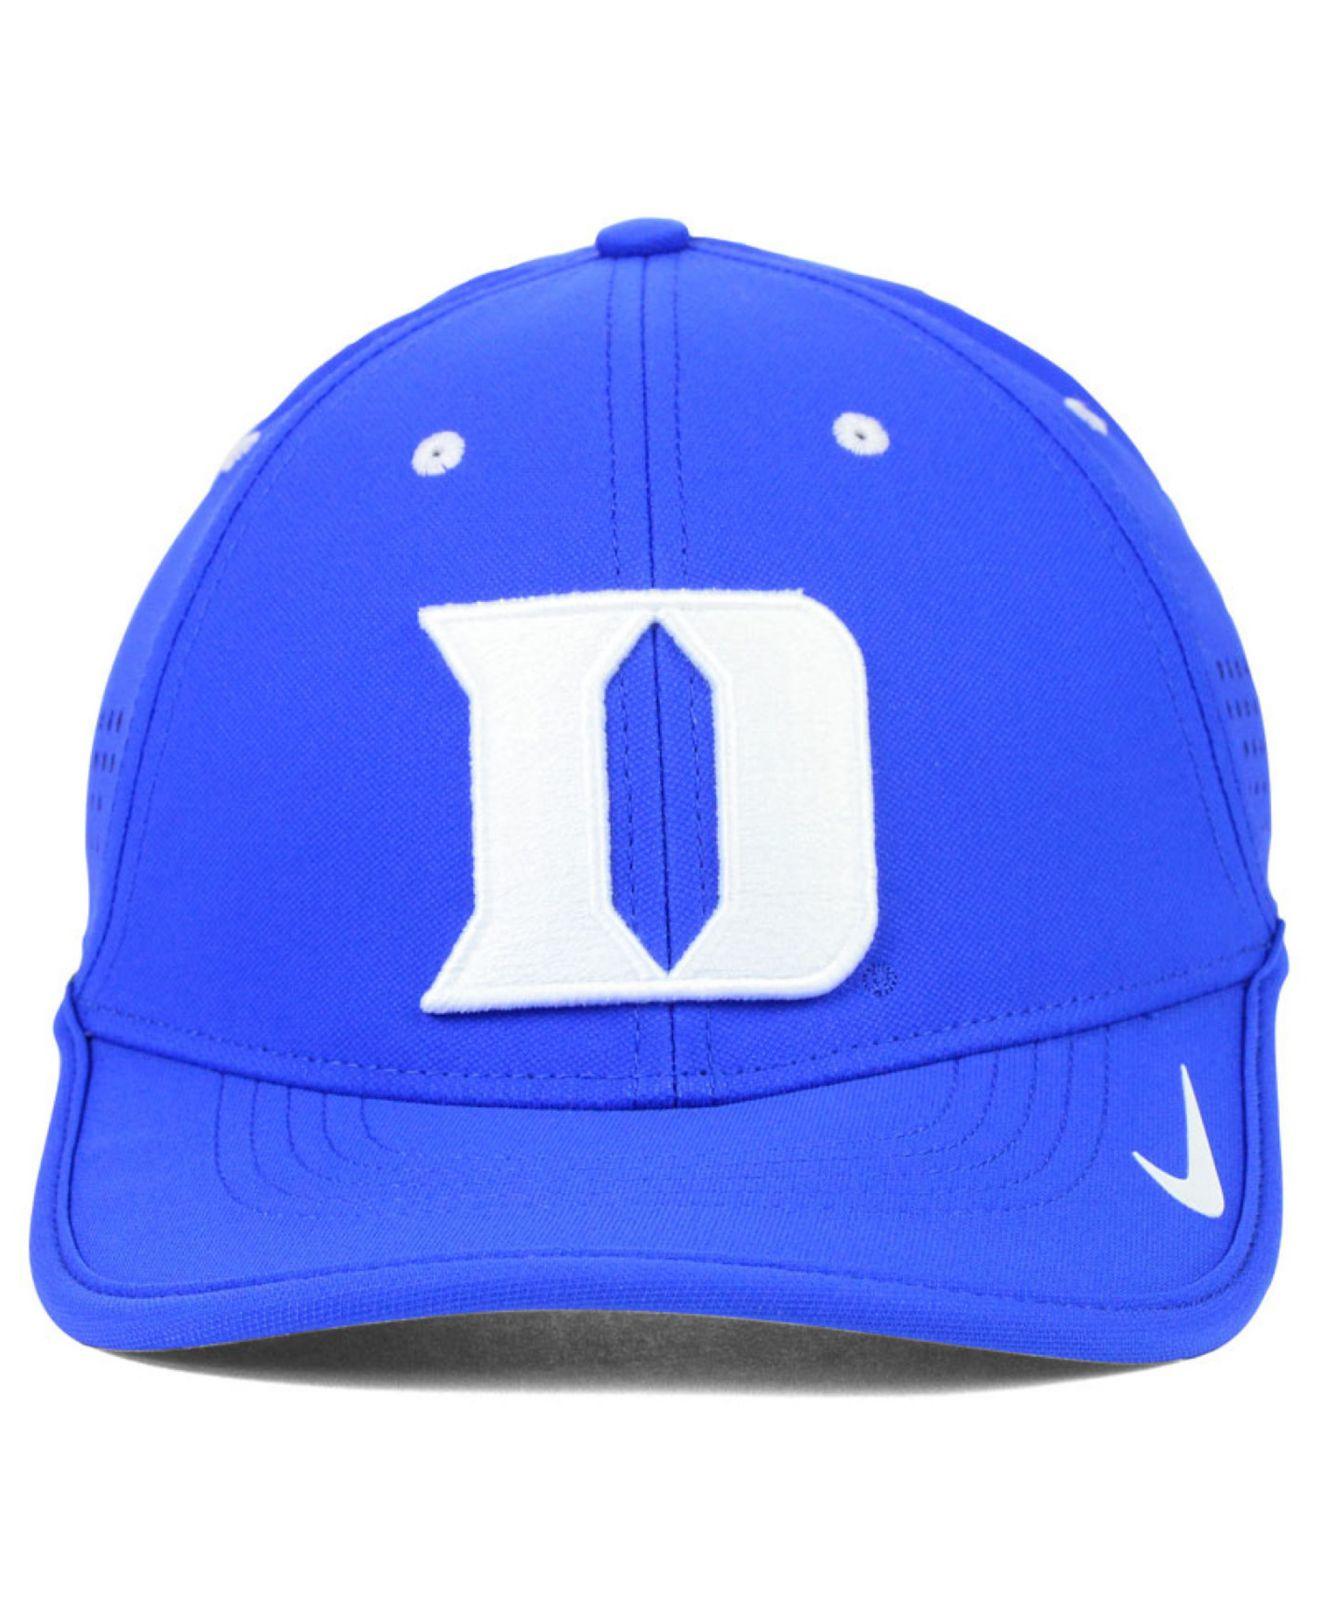 new product 2430e 504d6 ... official lyst nike duke blue devils dri fit coaches cap in blue for men  40879 a46cf